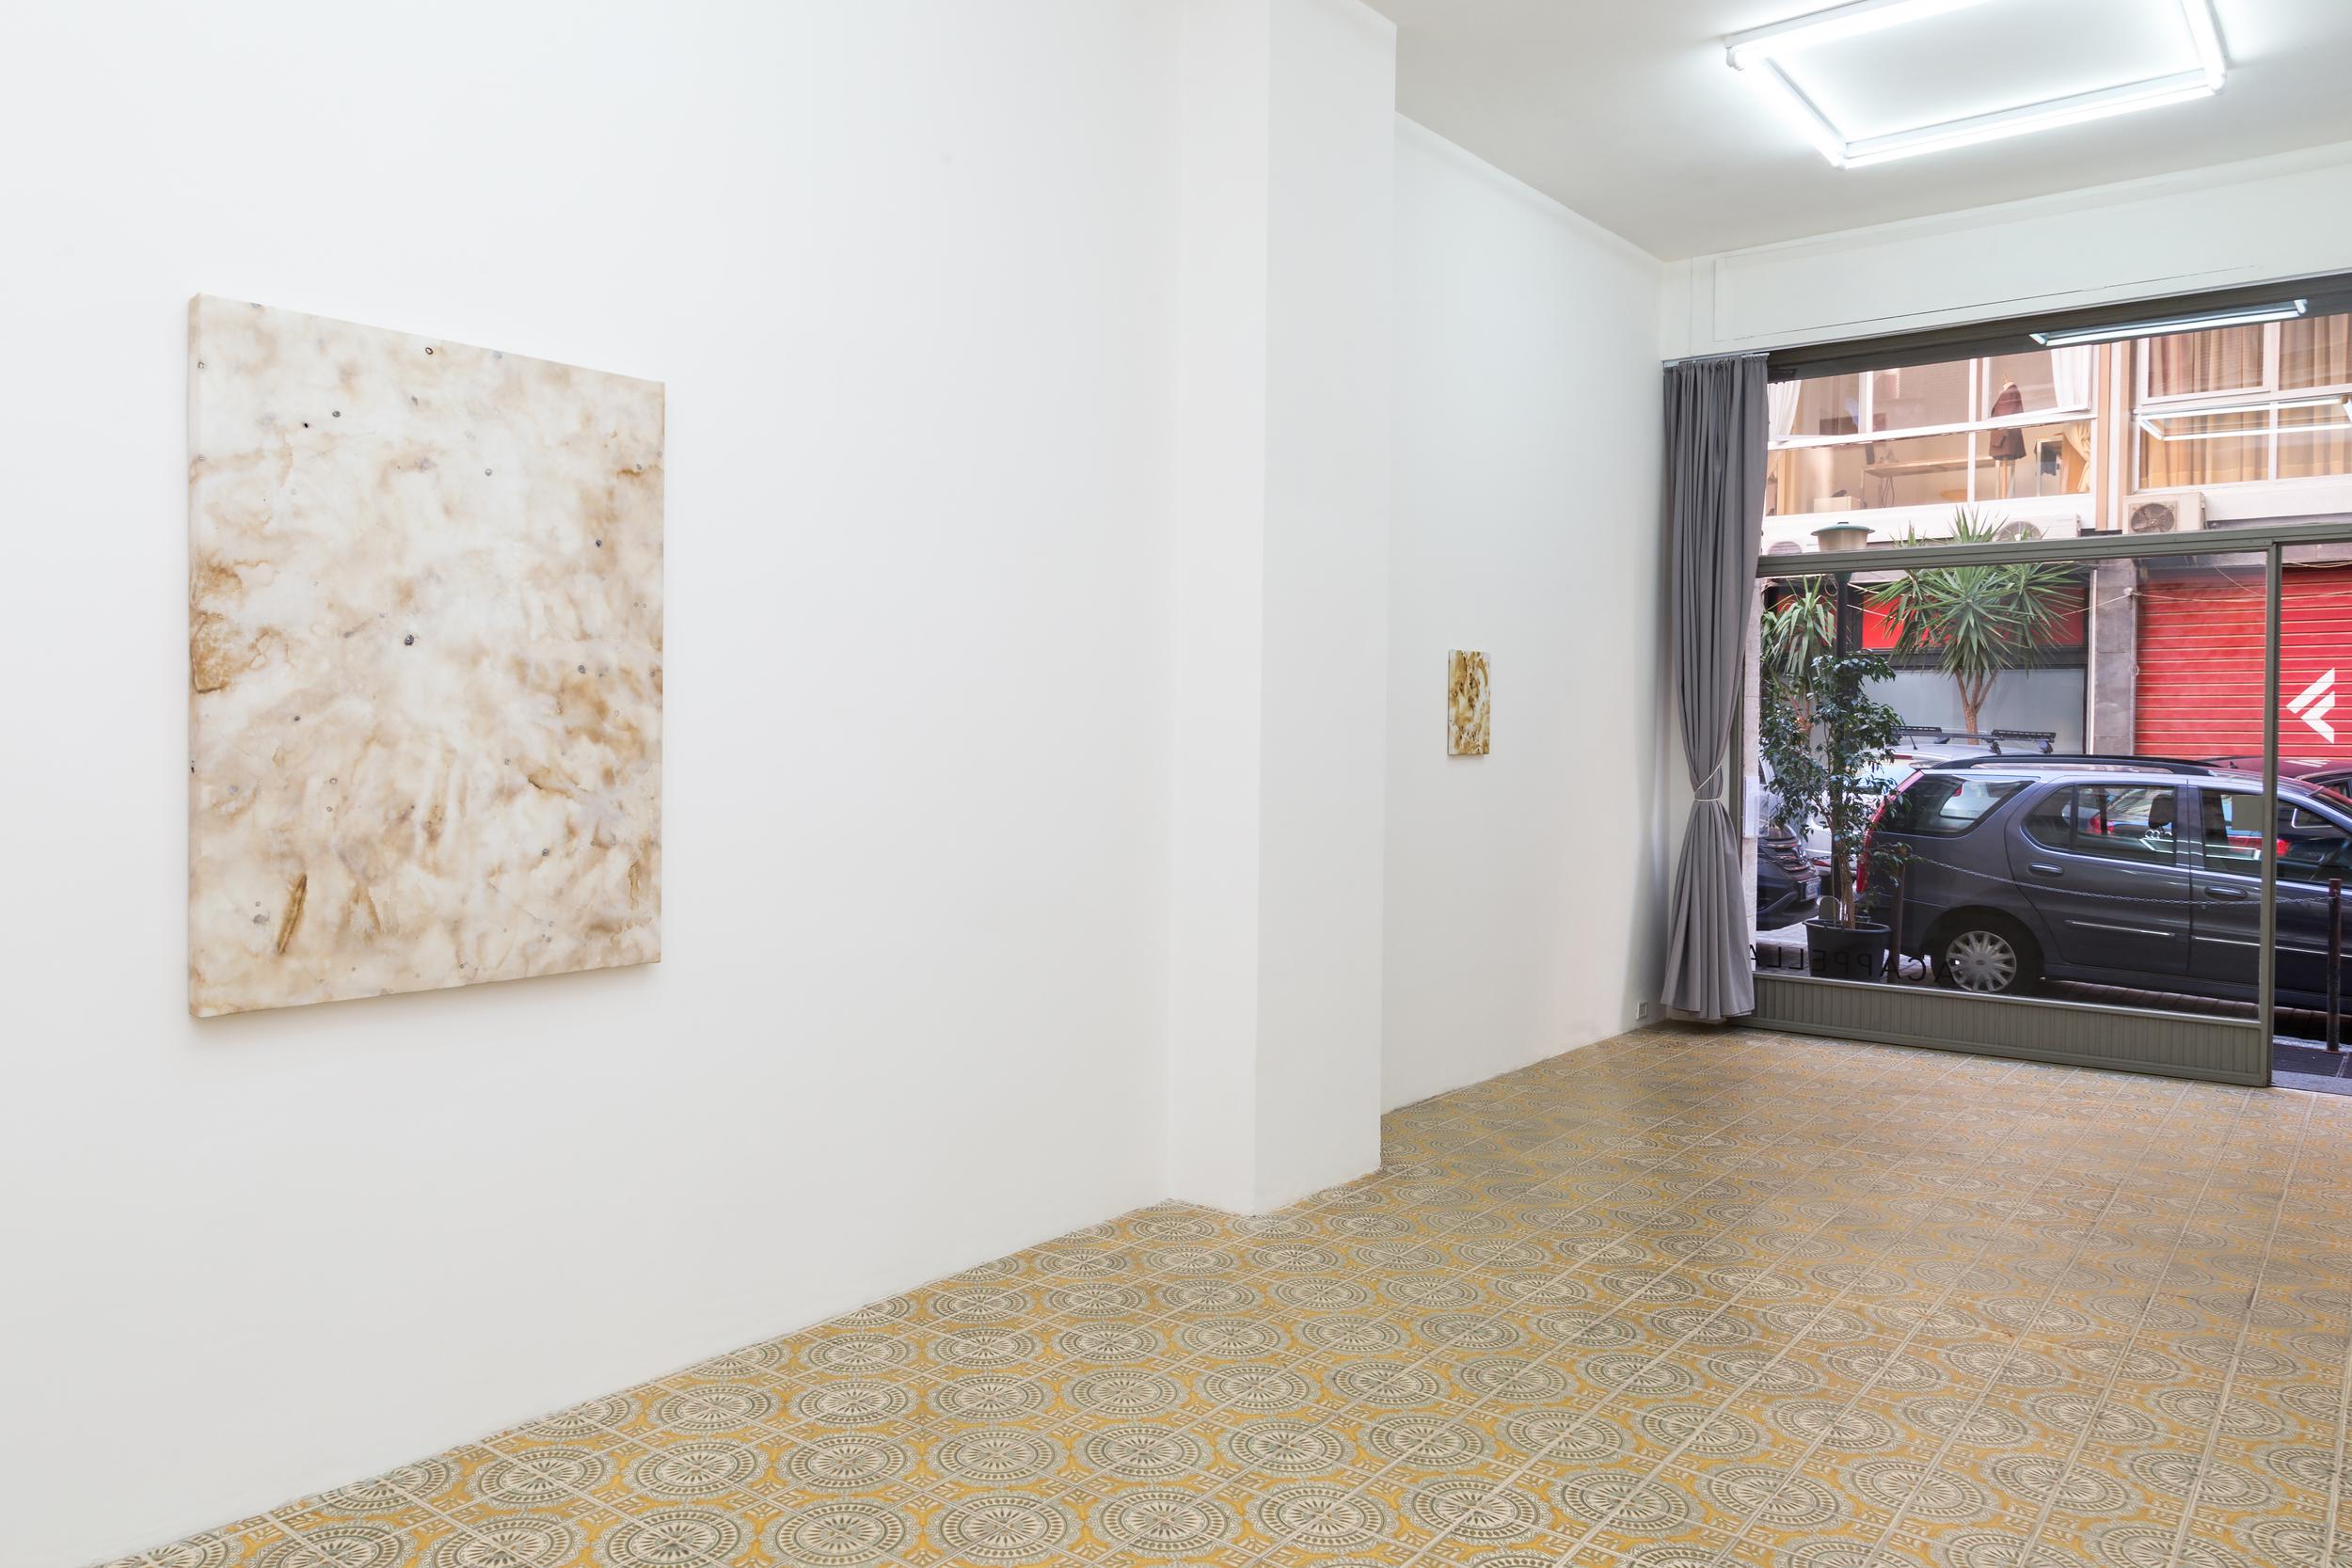 Installation shot for Domenica at Galleria Acappella. Naples, Italy